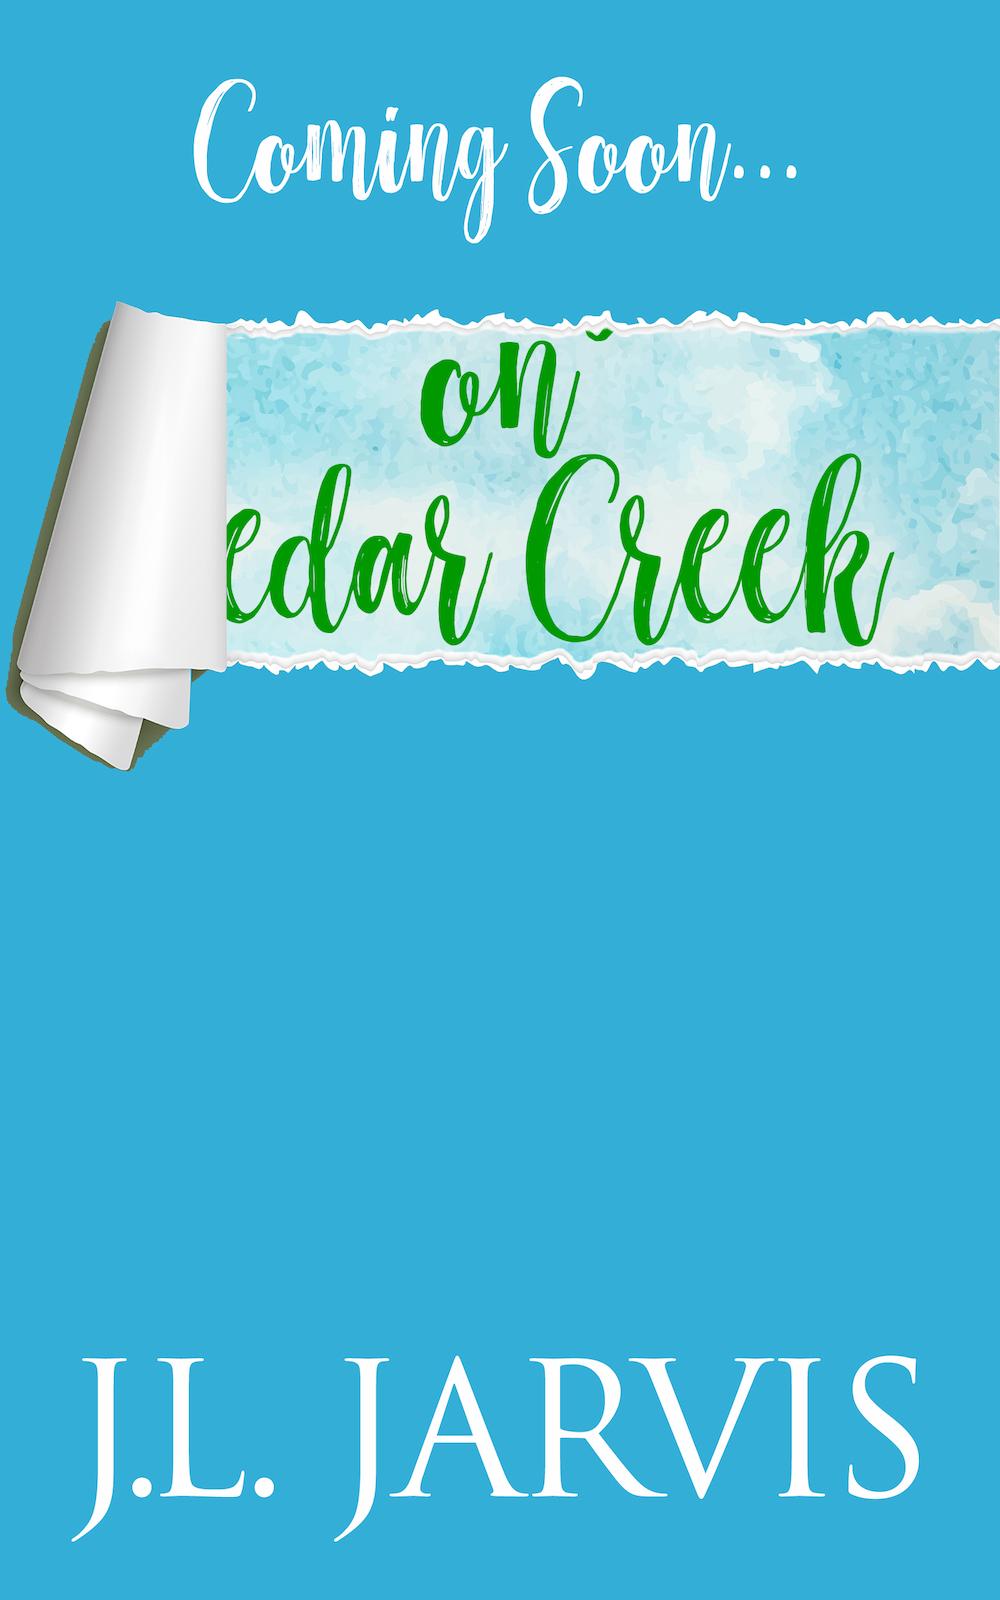 Coming Soon (3rd Cedar Creek book)